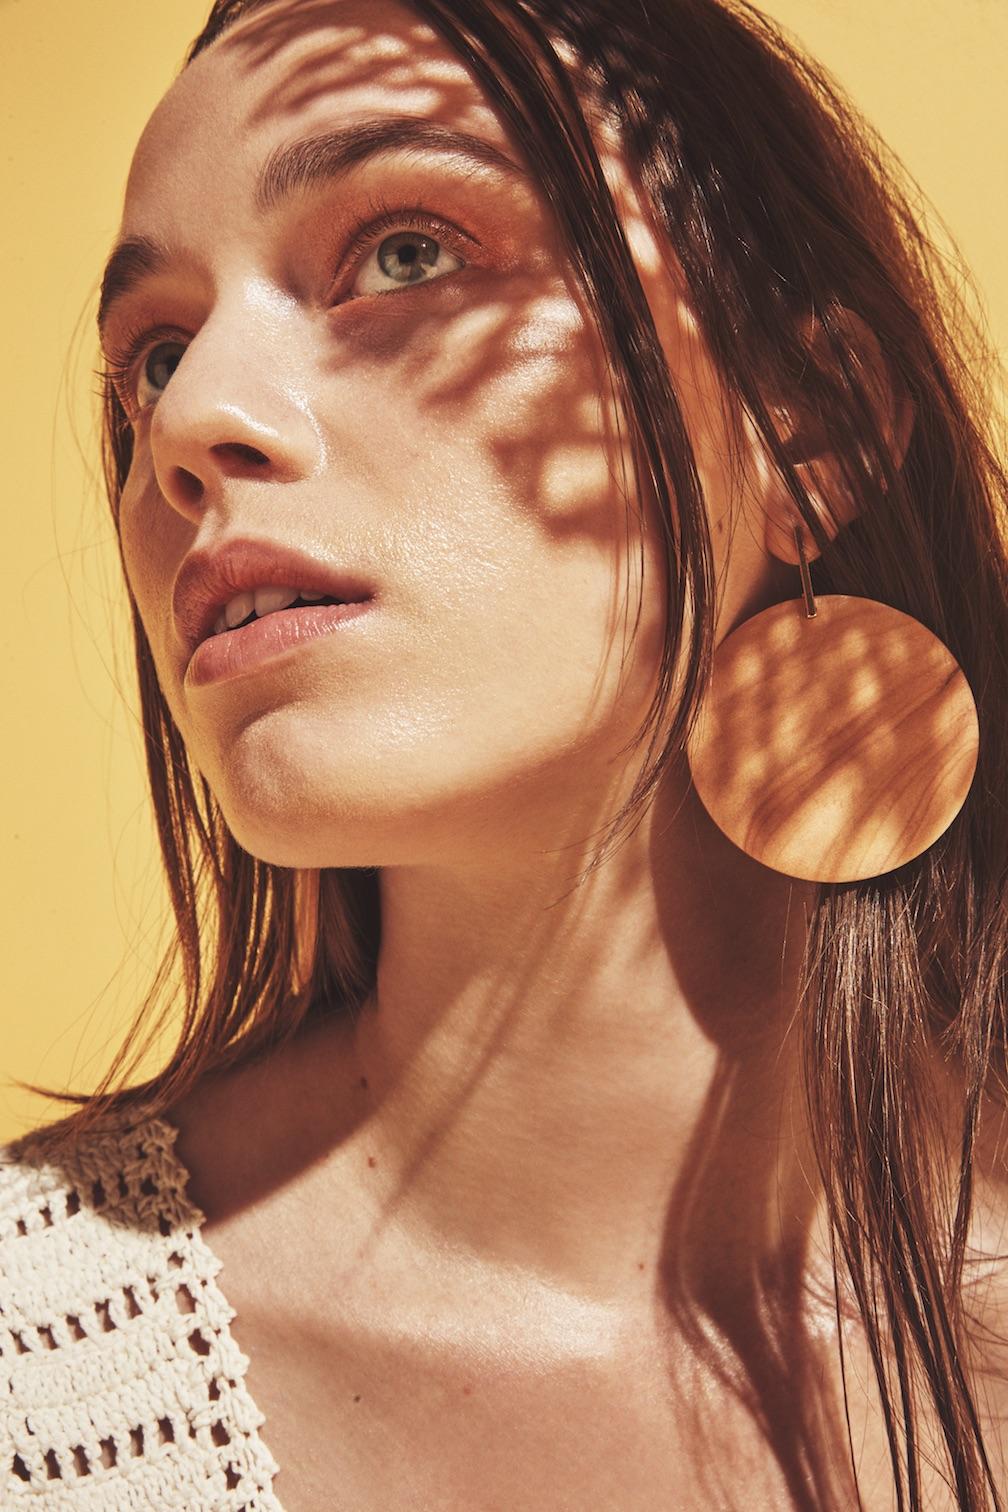 She Made Me top, Sophie Monet earrings.